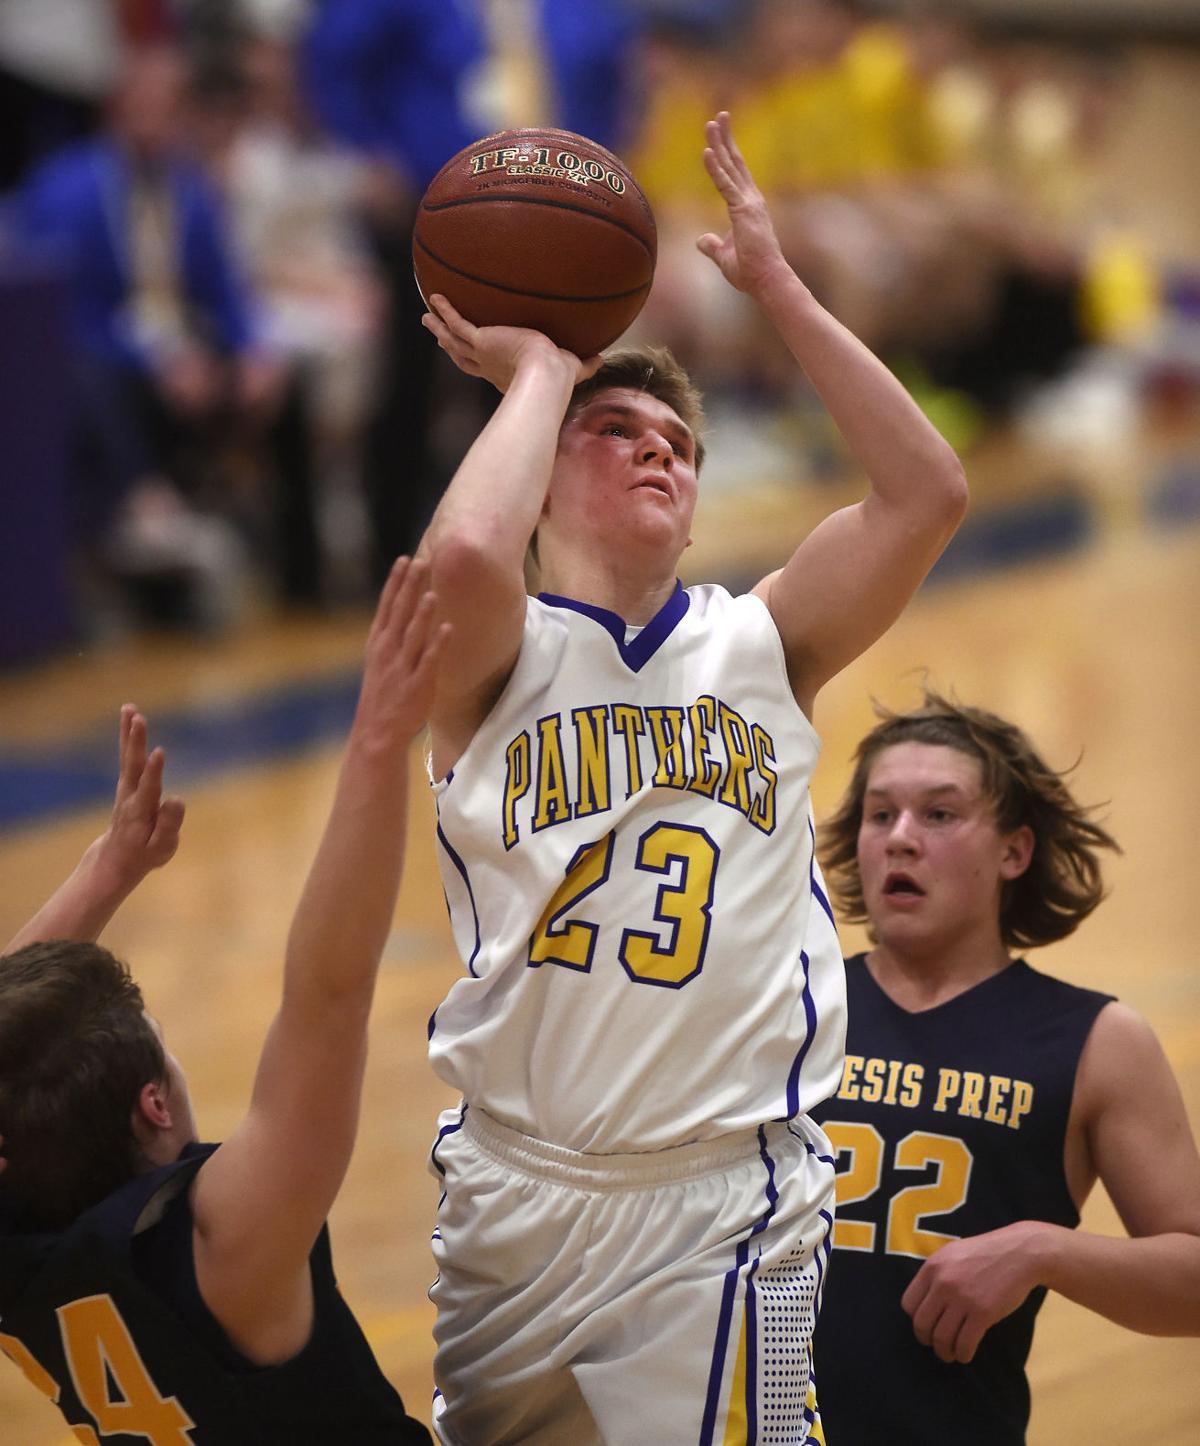 Boys Basketball Championships - Genesis Prep Vs. Carey